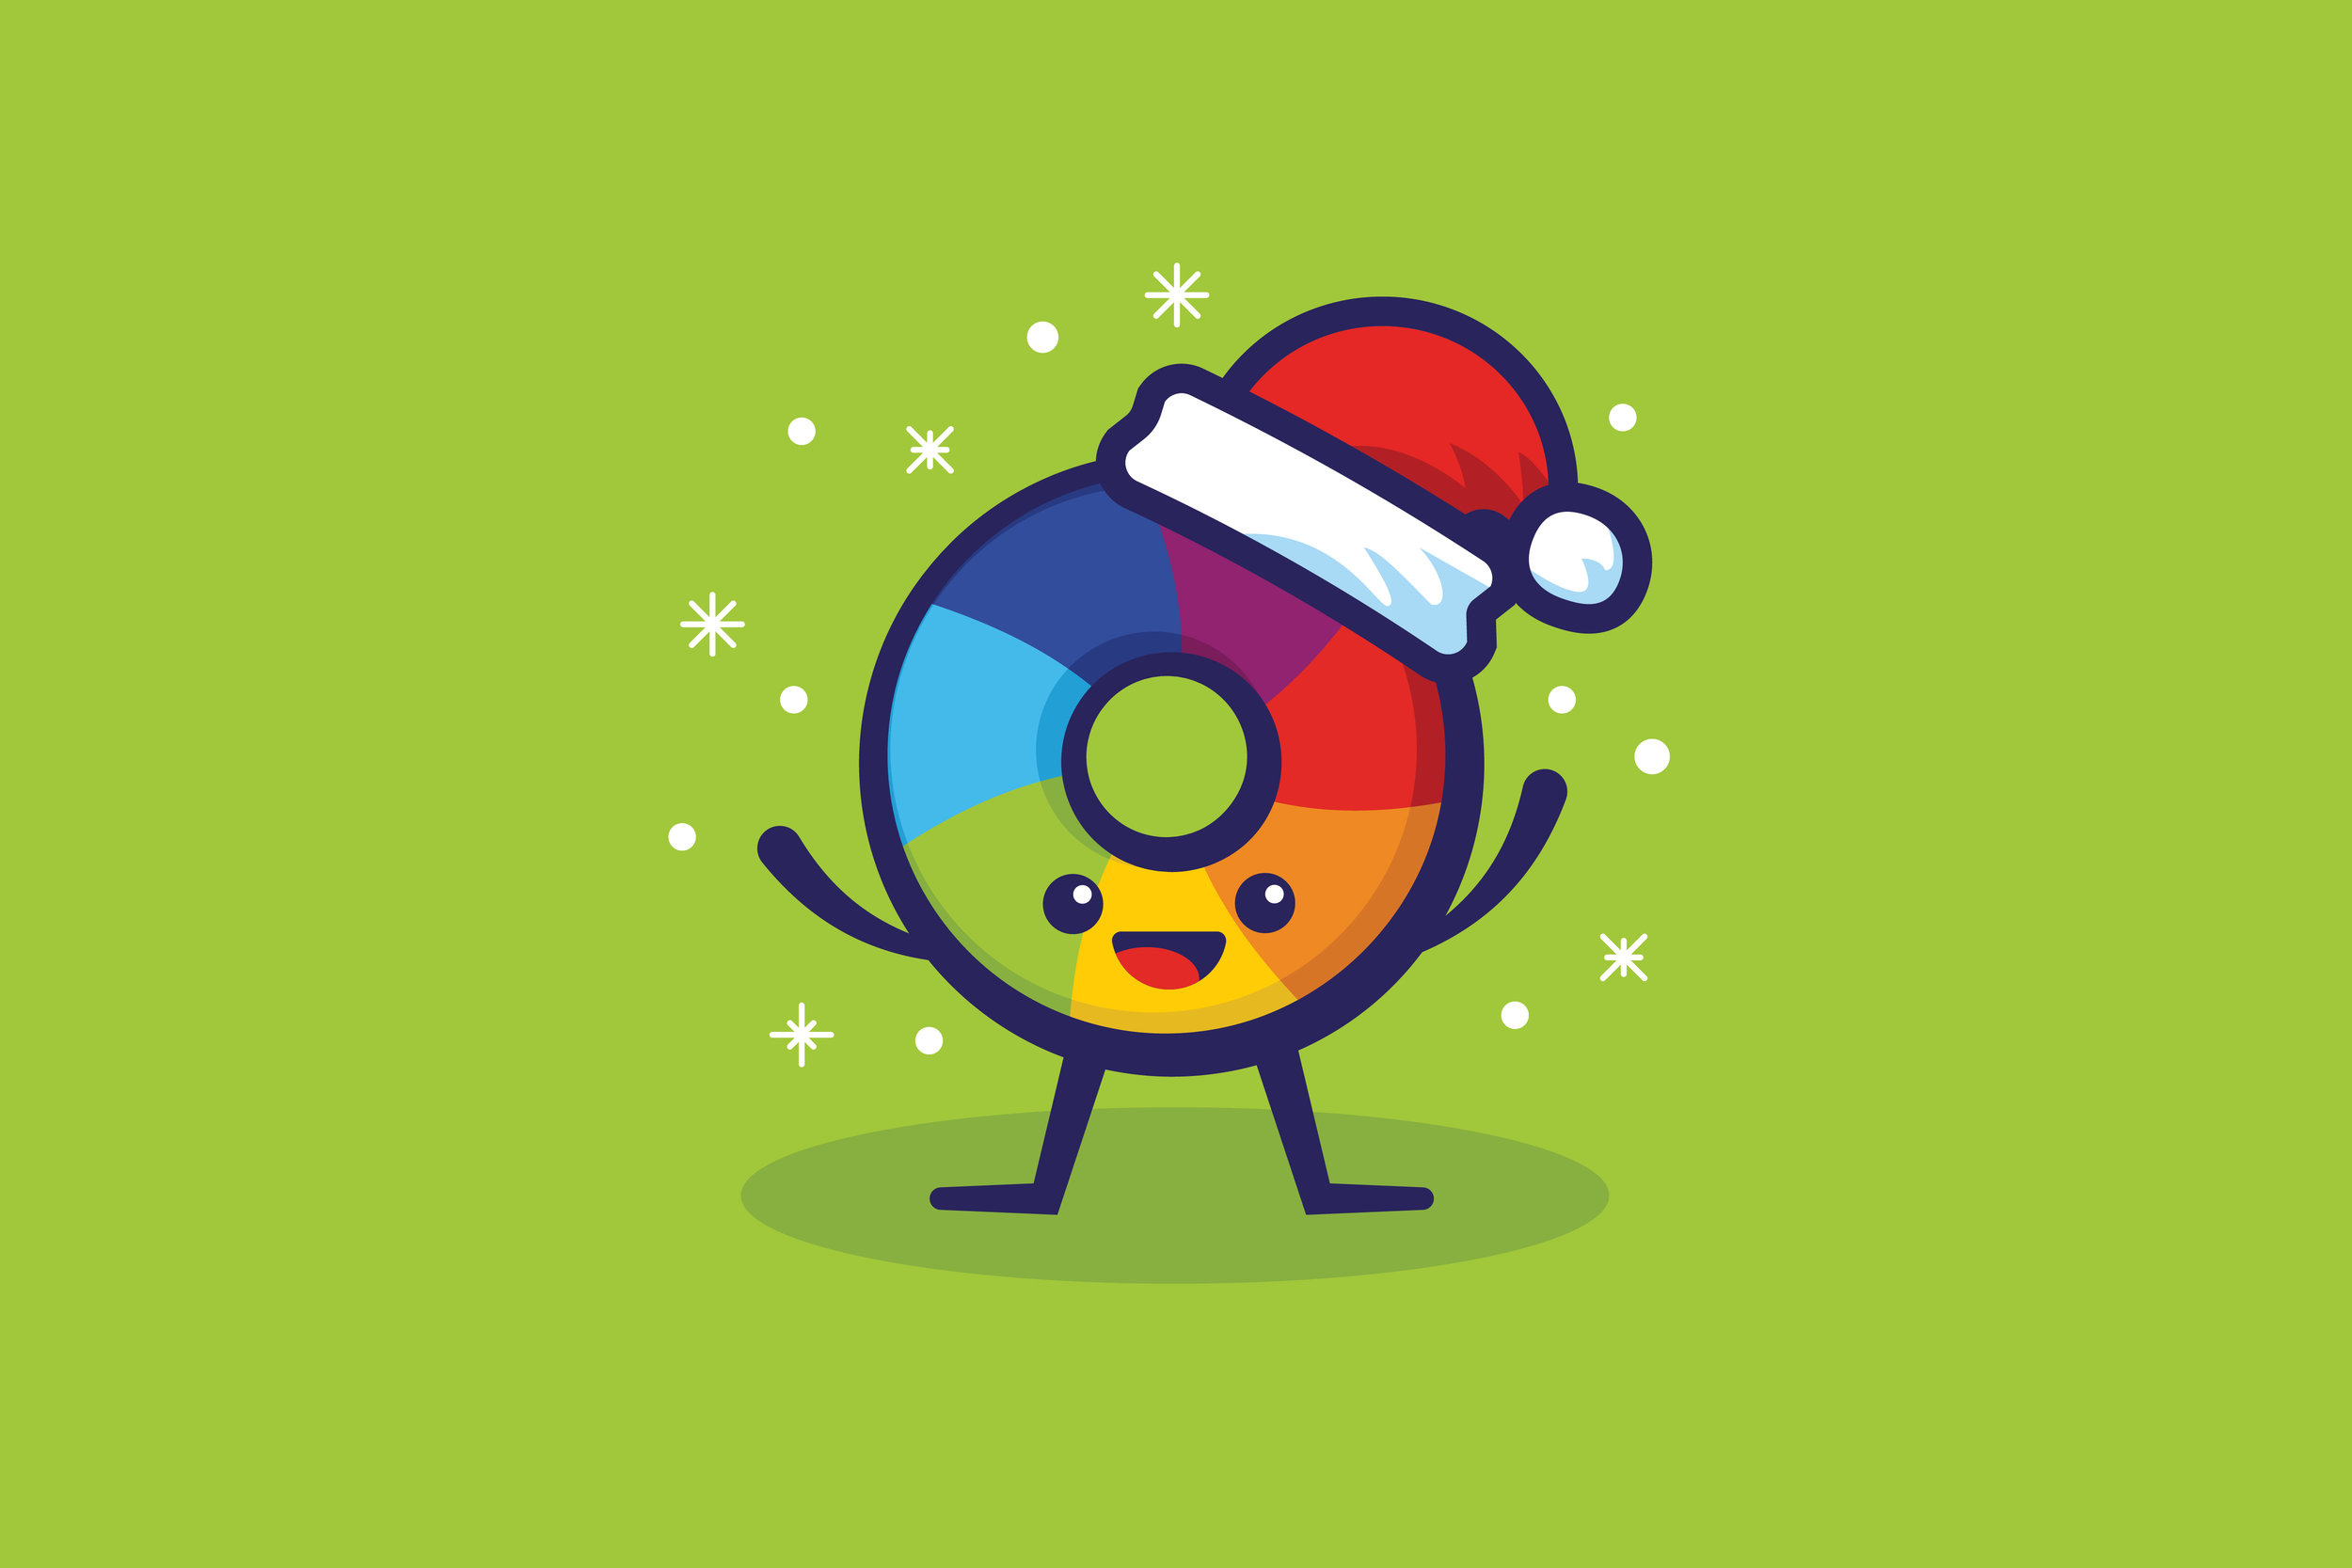 Altmetric_Character_Scenes_R3_v1_christmas.jpg